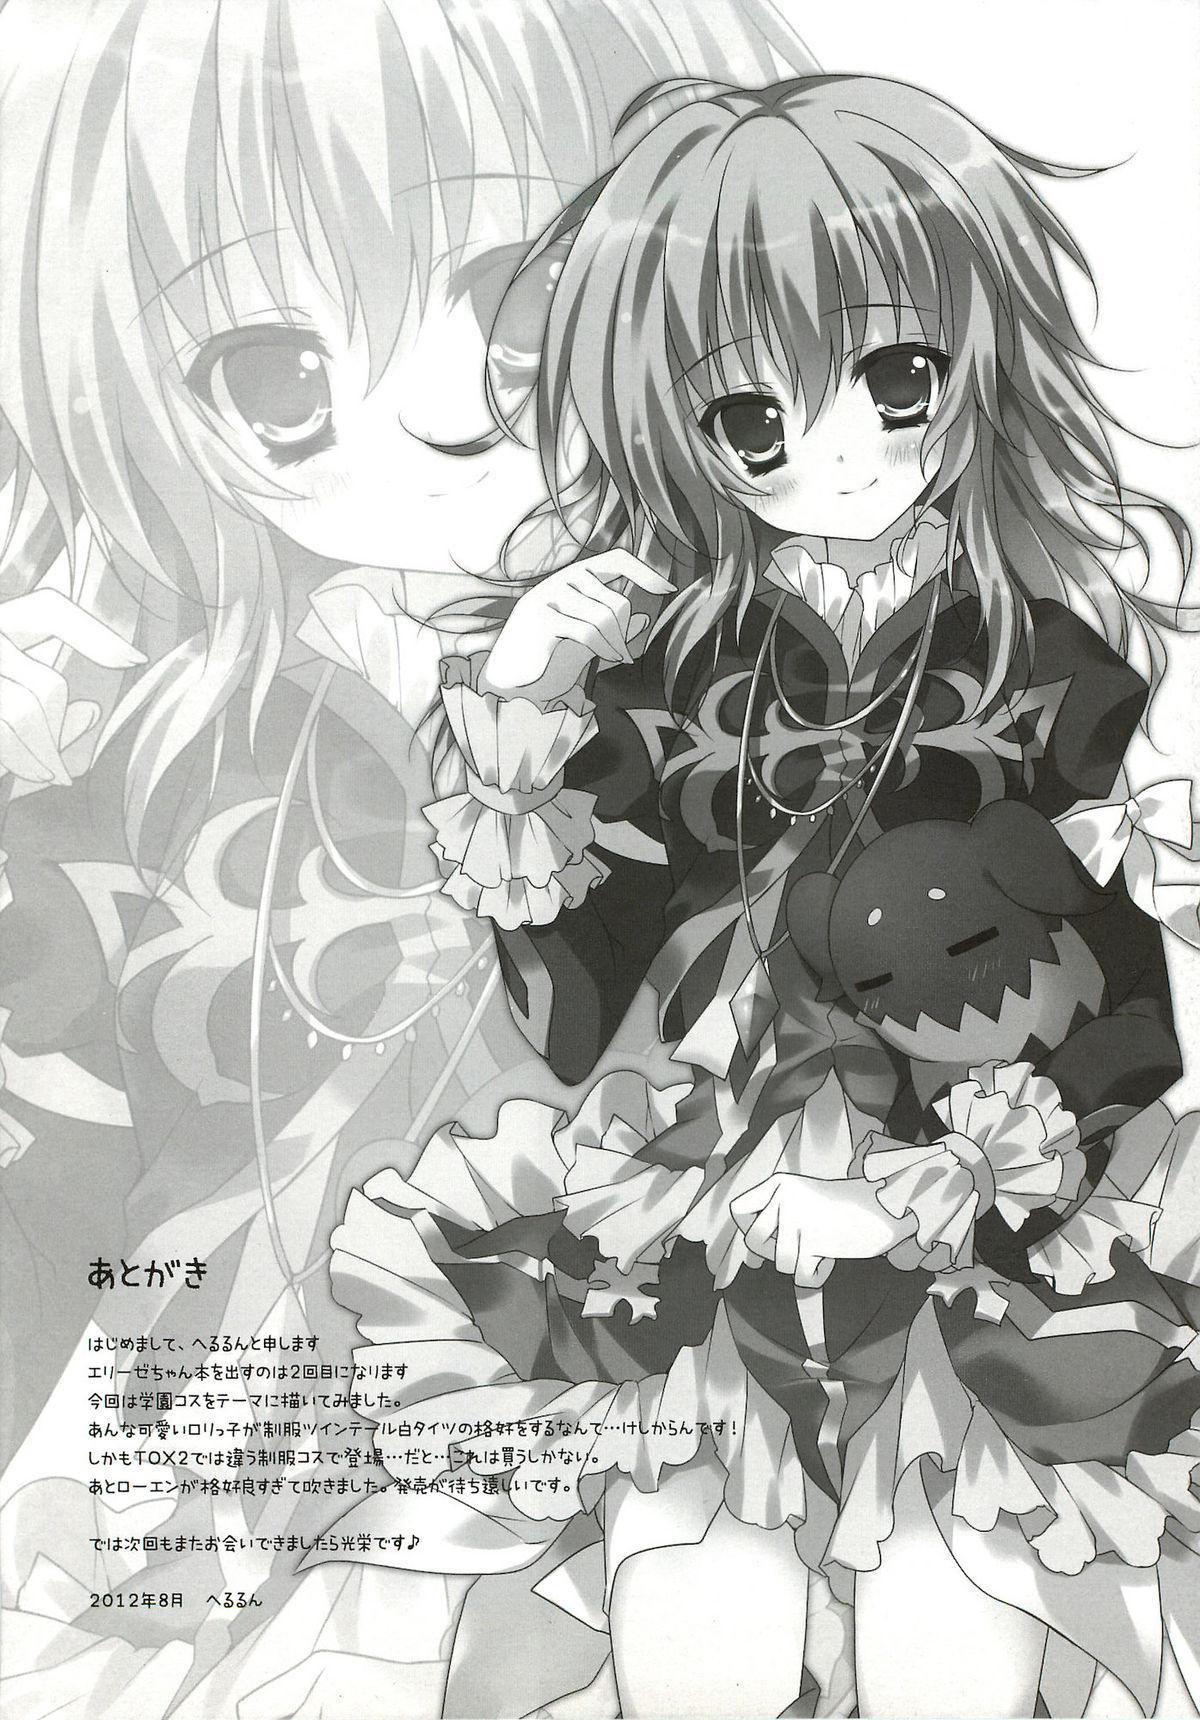 Elise-chan ga Itazura Sarechau Hon 15